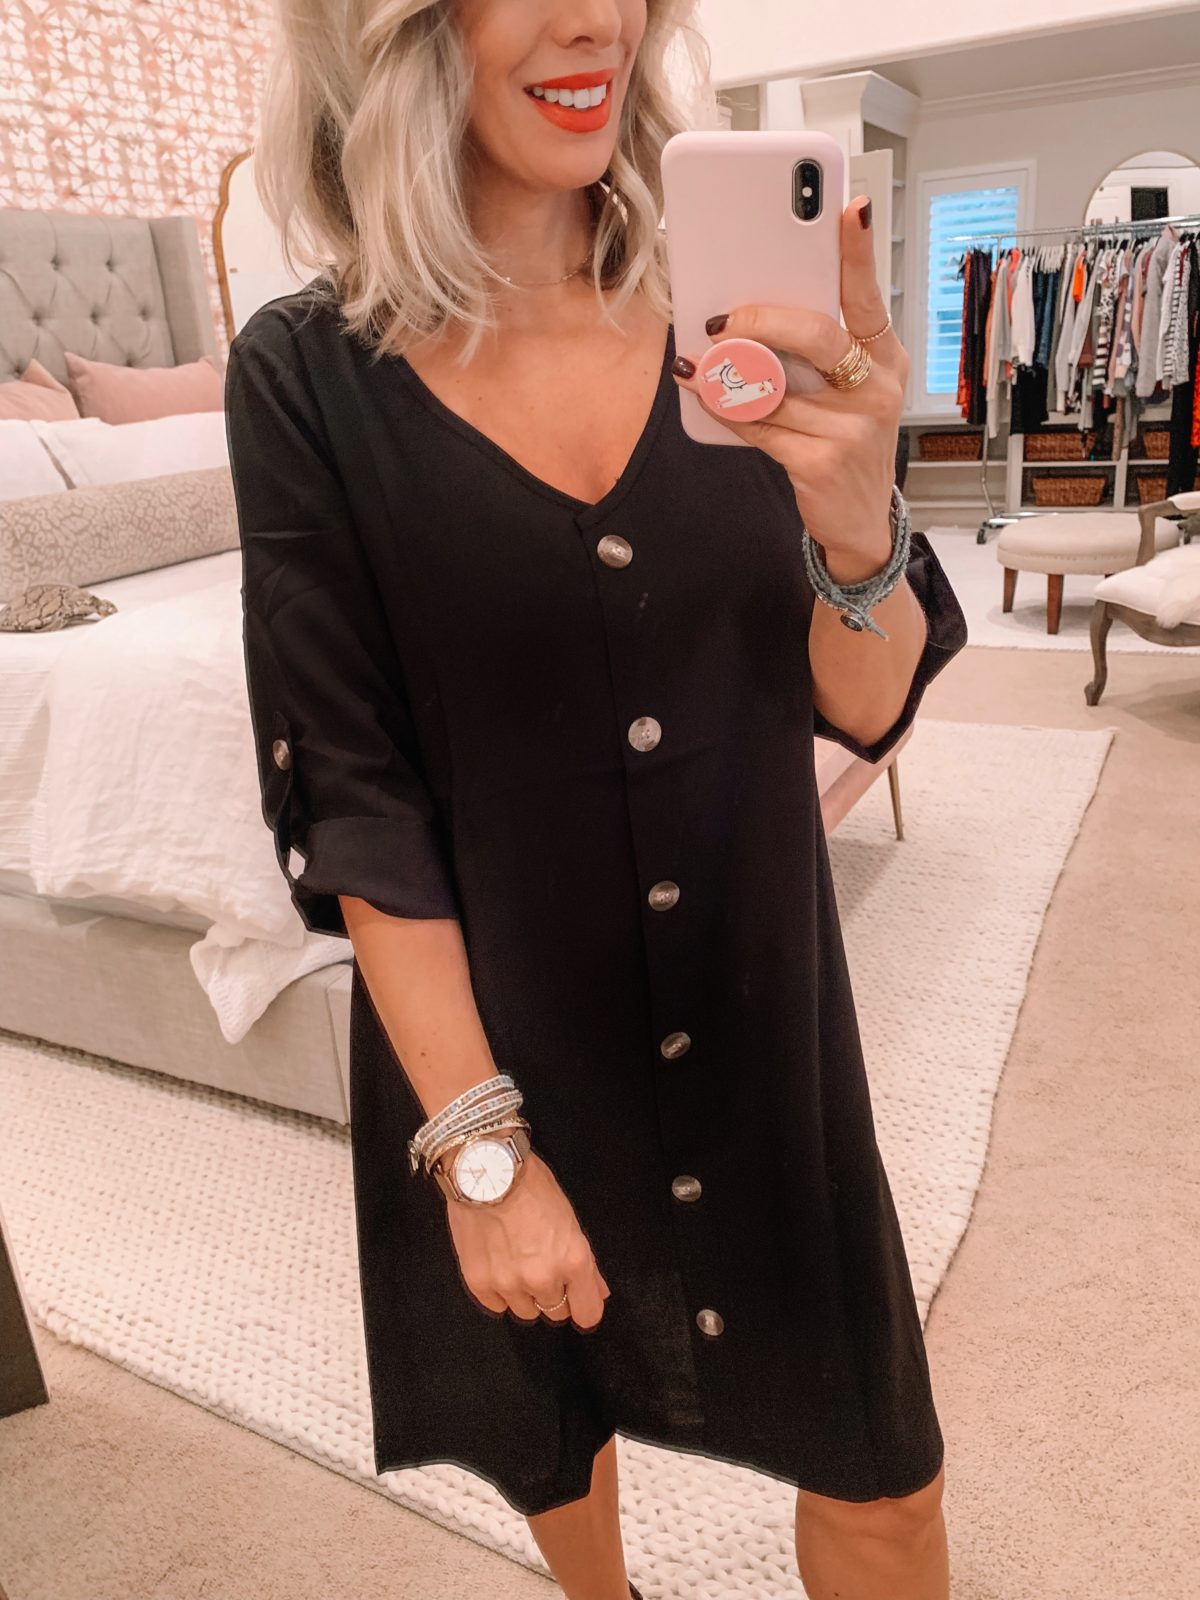 Amazon fashion haul, button down dress